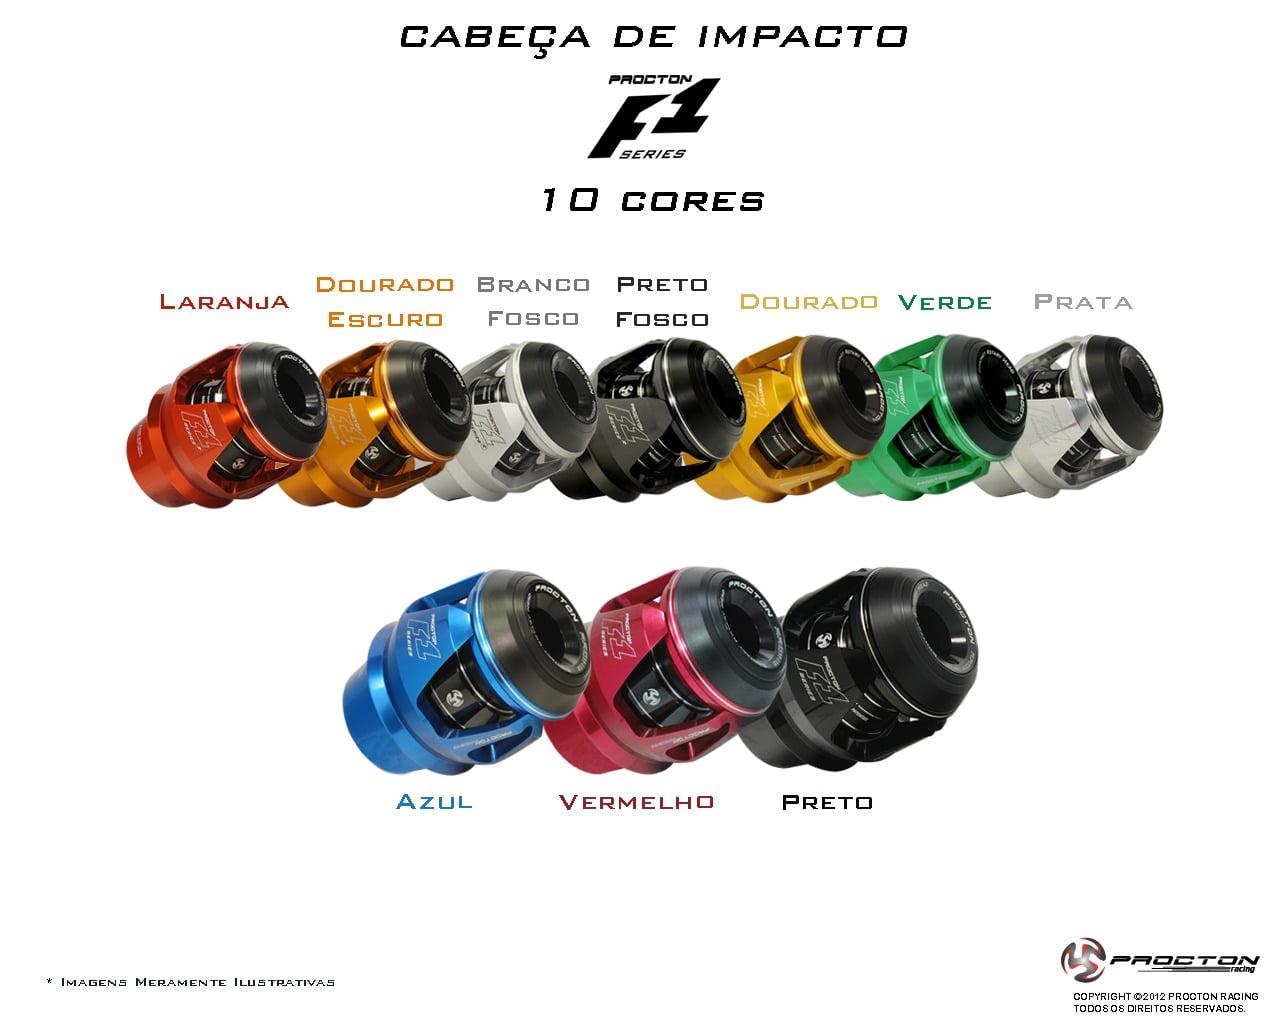 Slider Protetor de Motor CBR 500 R Motocicleta Honda CBR500R - Procton